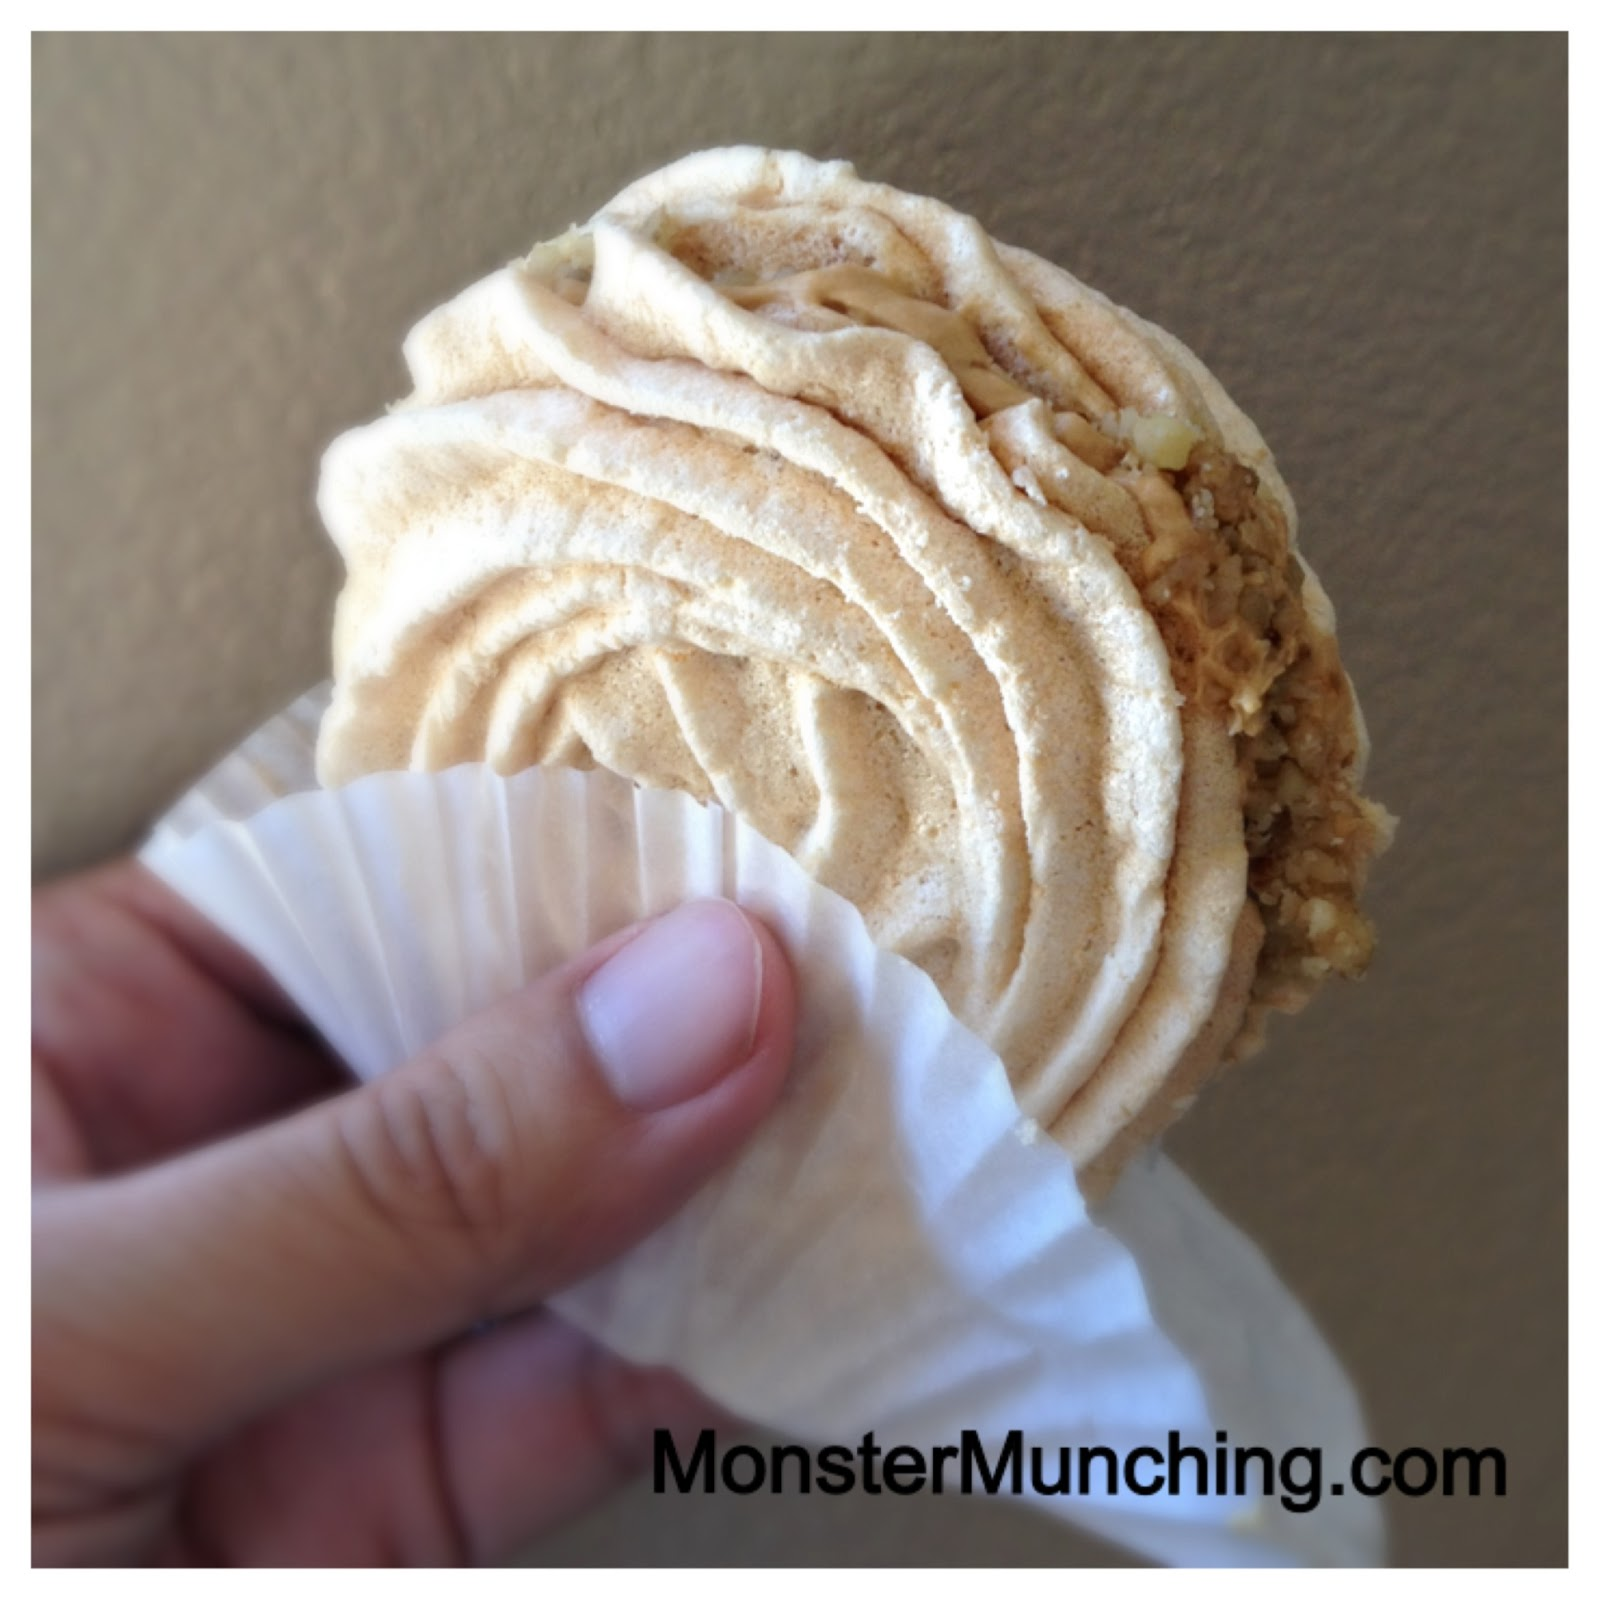 ... Munching: Meringue Cookie Sandwiches at Karina's Cake House - Glendale